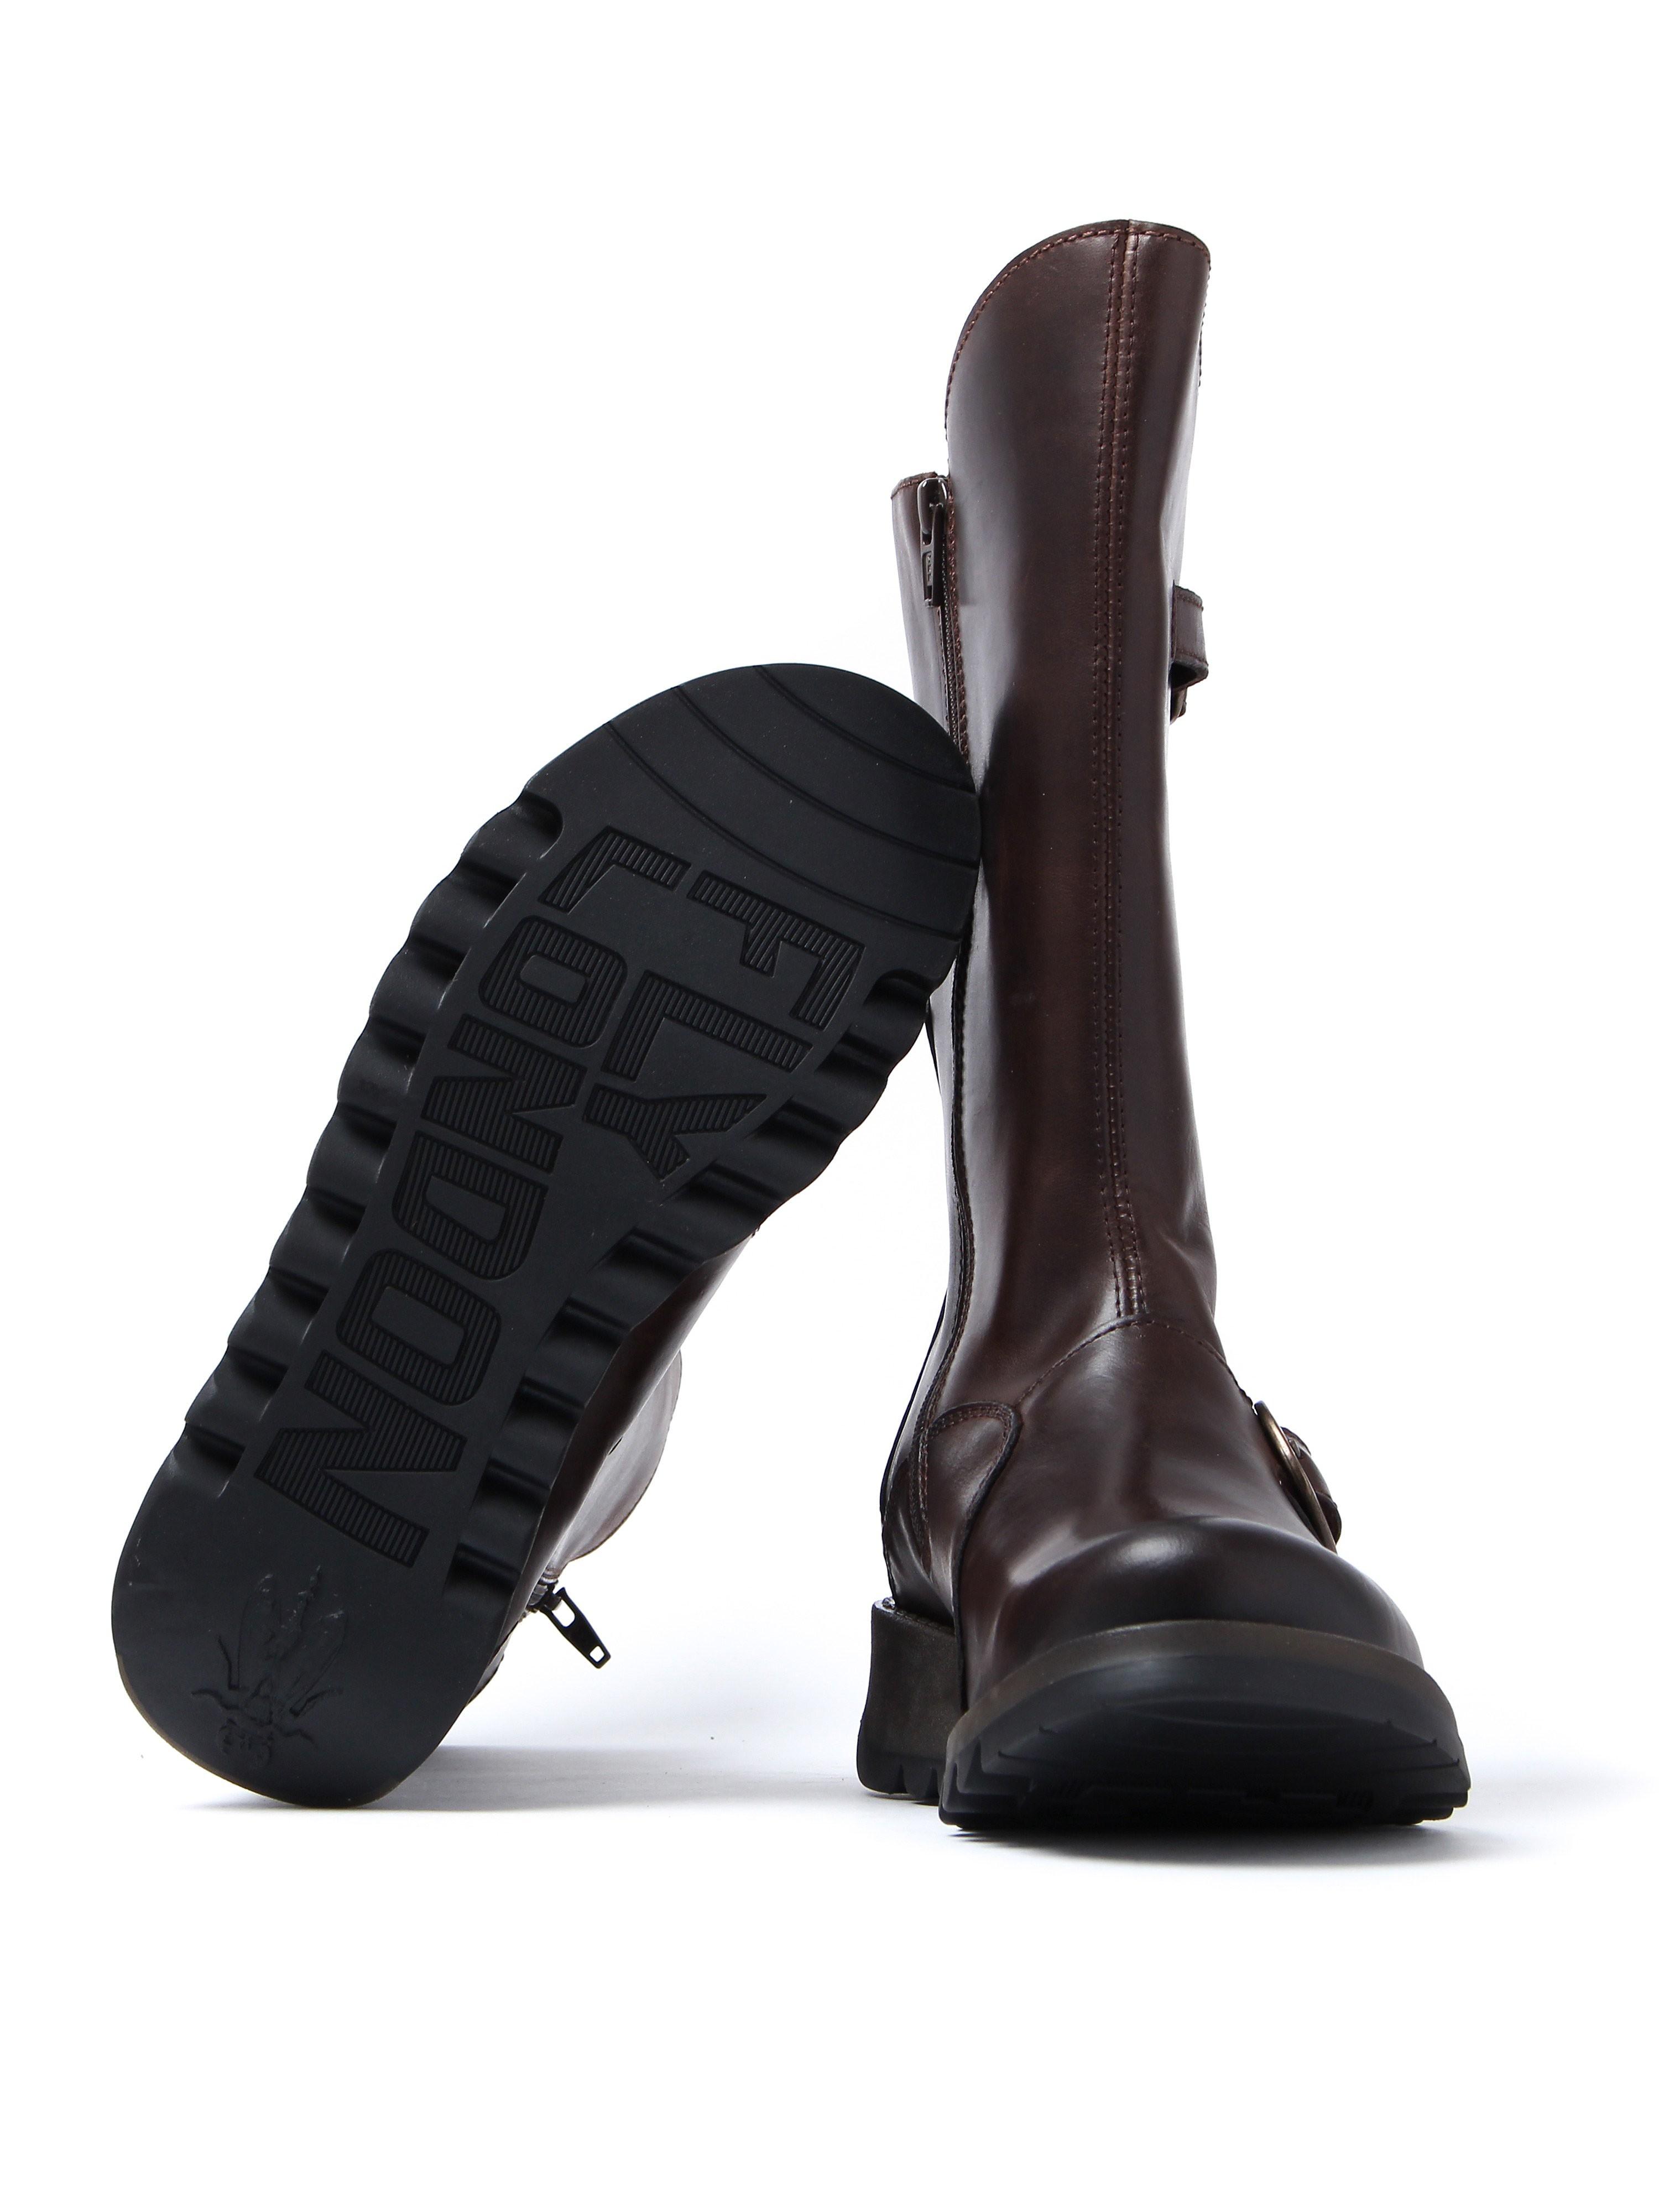 Fly London Women's Mes 2 Biker Boots - Dark Brown